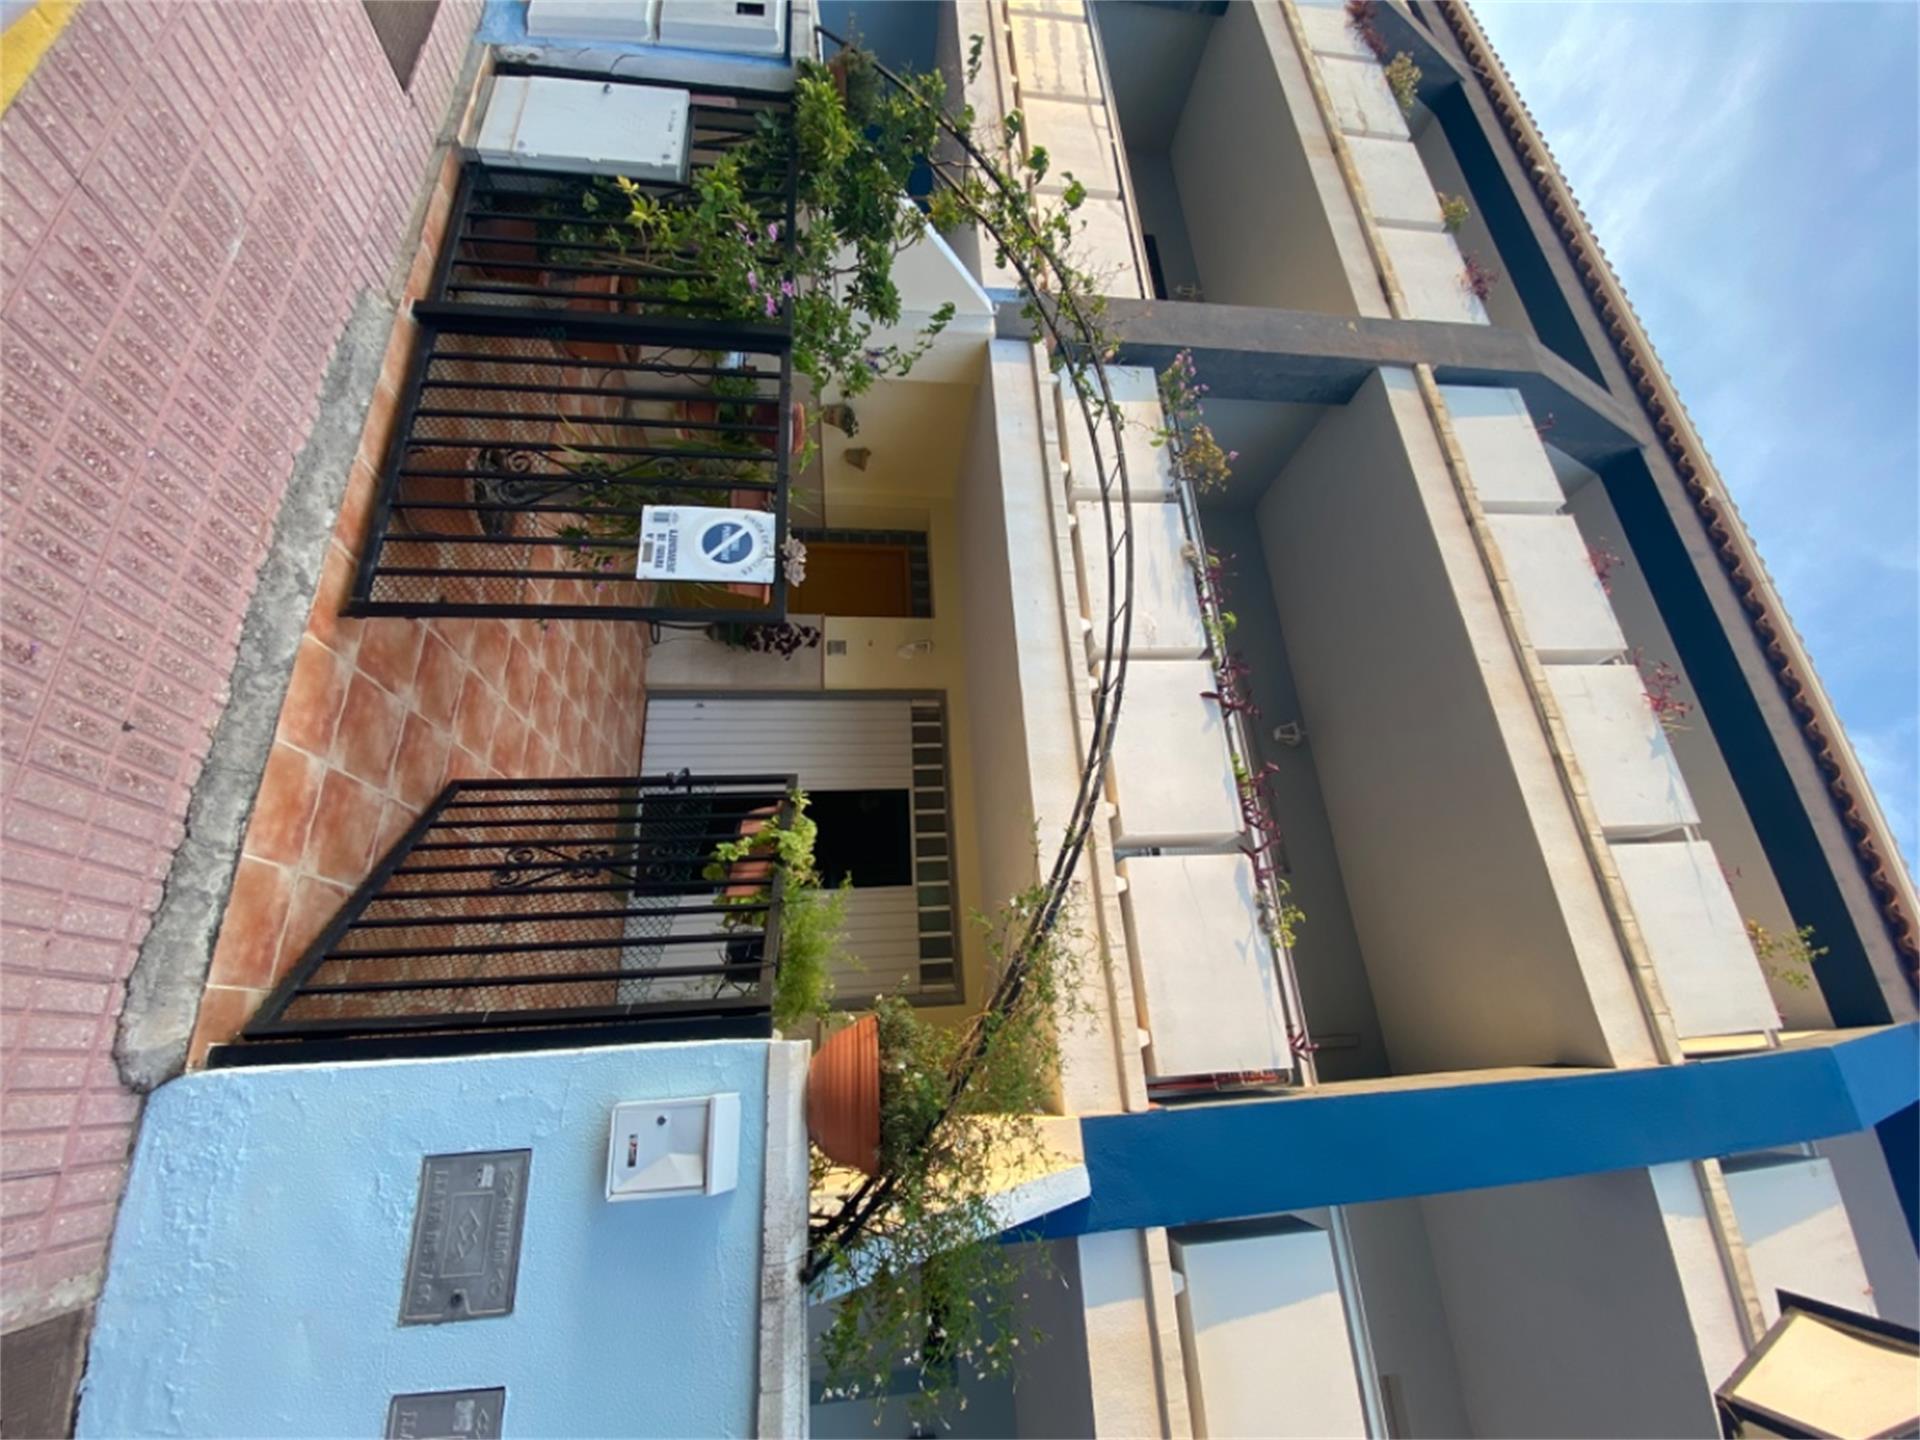 Reihenhaus  Calle villelaure. Favara / calle villelaure